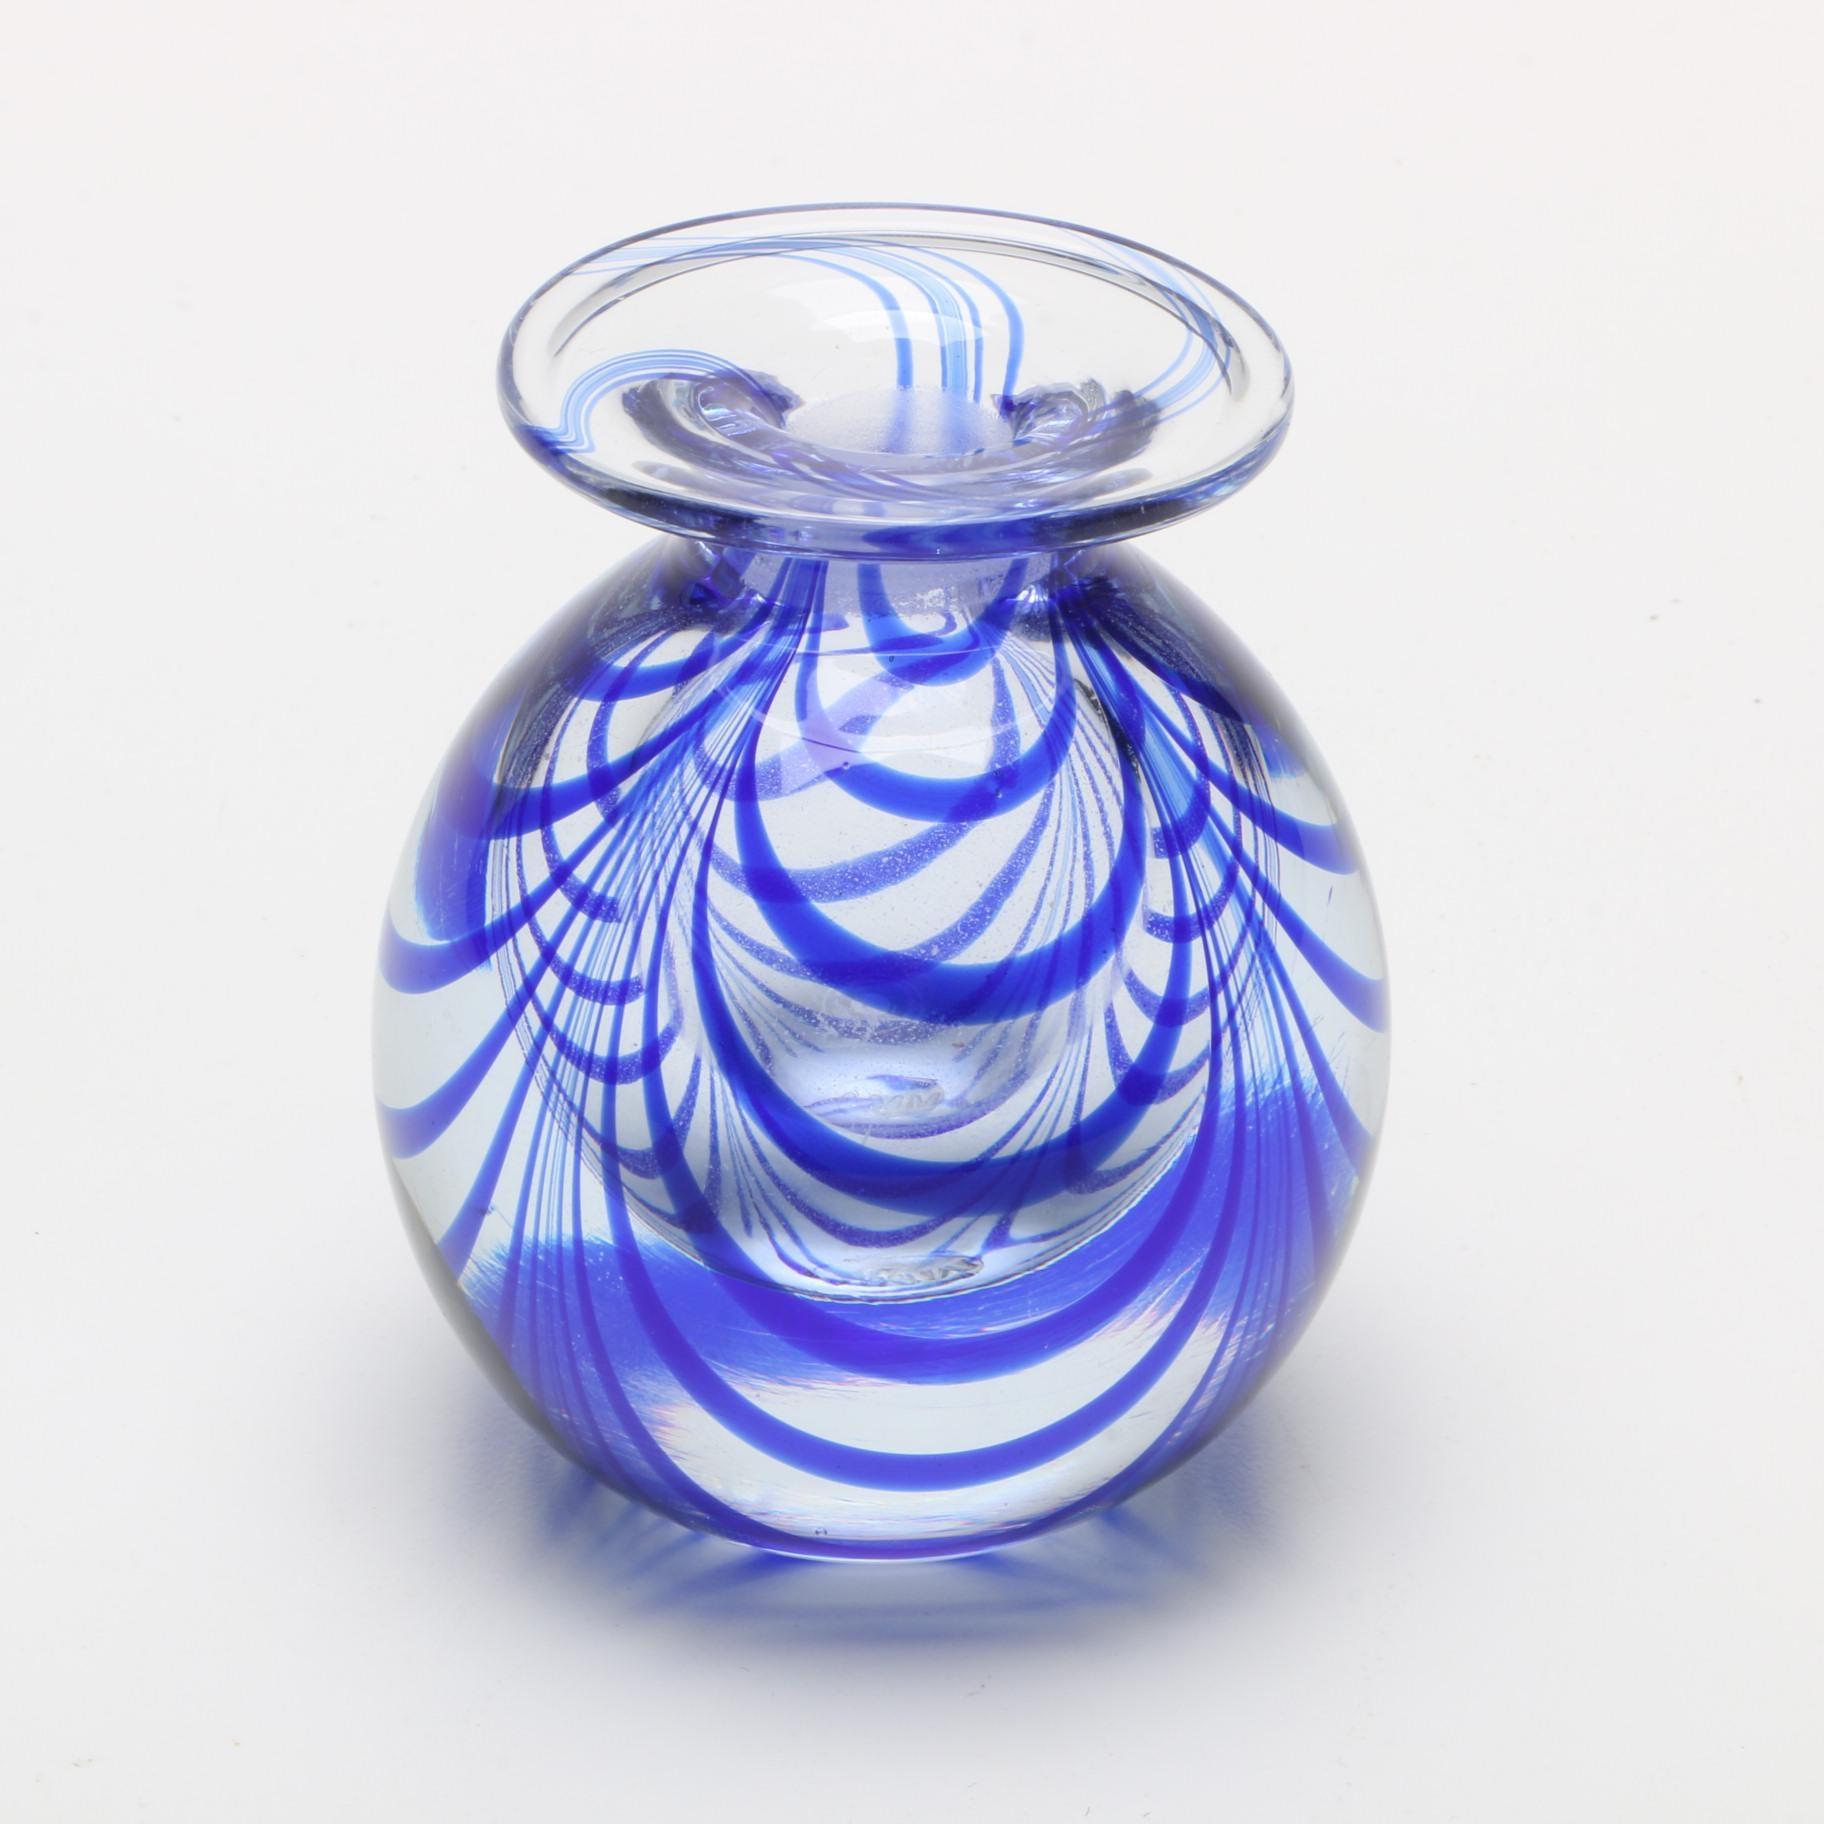 Metropolitan Museum of Art Cobalt Swirled Art Glass Vase